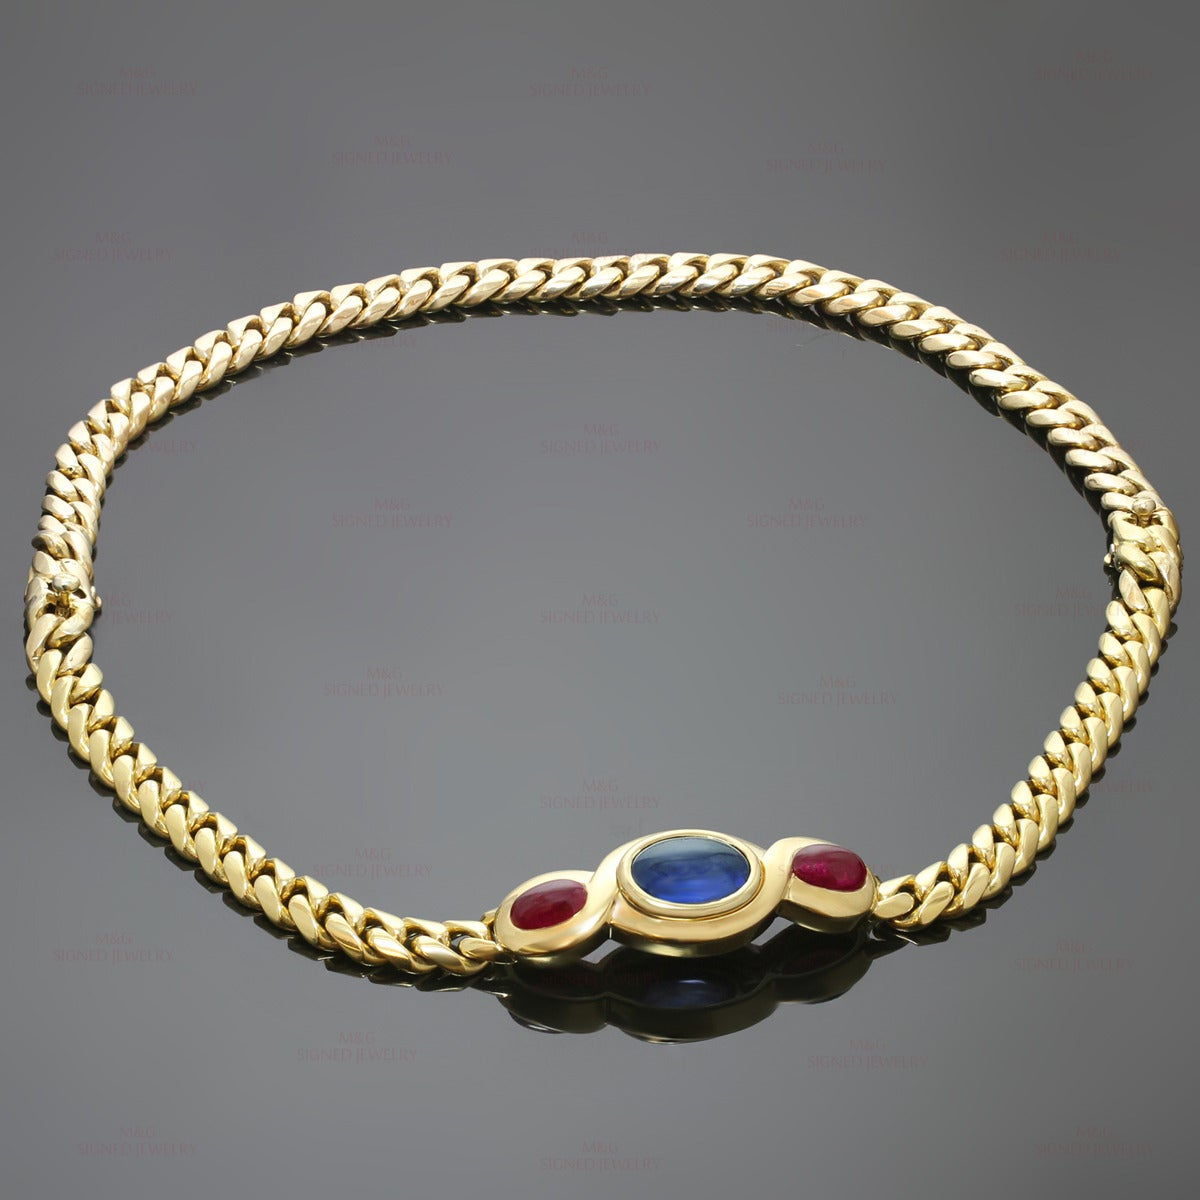 1980s Bulgari Classic Sapphire Ruby Gold Link Interchangeable Bracelet Necklace 2